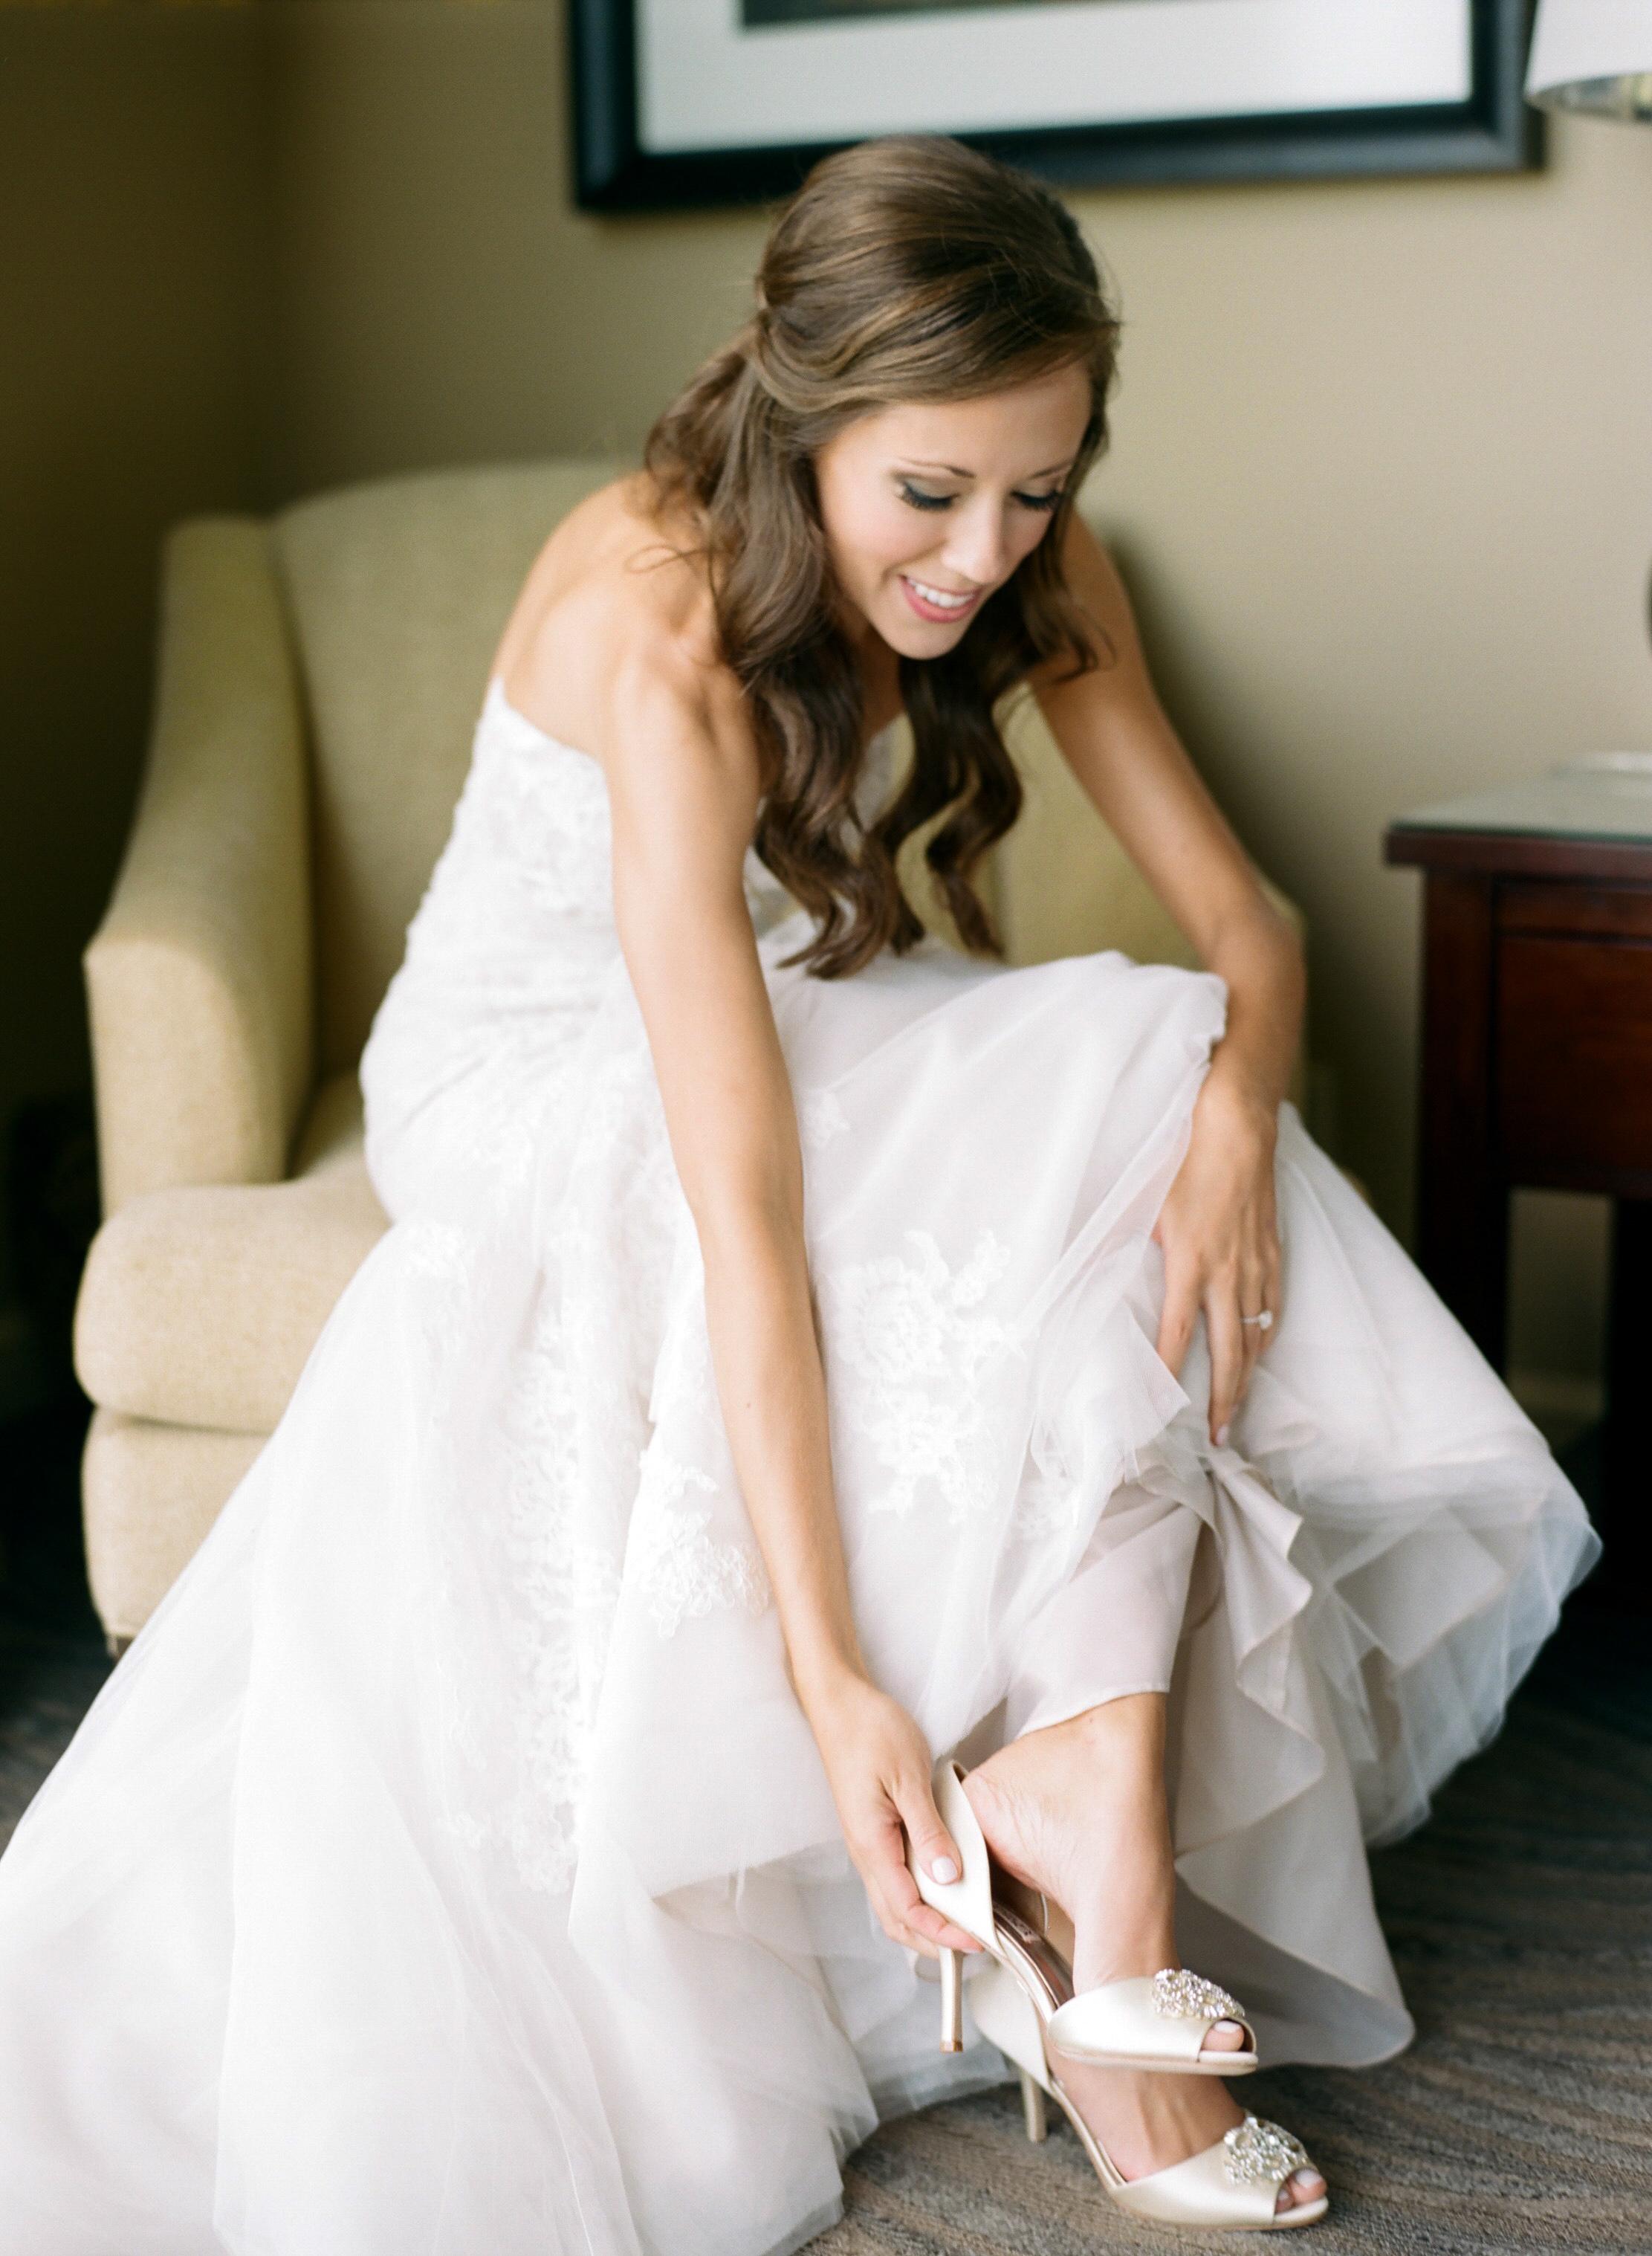 St.-Philip-Presbyterian-Church-Houston-Wedding-Ceremony-The-Junior-League-Of-Houston-Reception-Dana-Fernandez-Photography-Fine-Art-Film-5.jpg